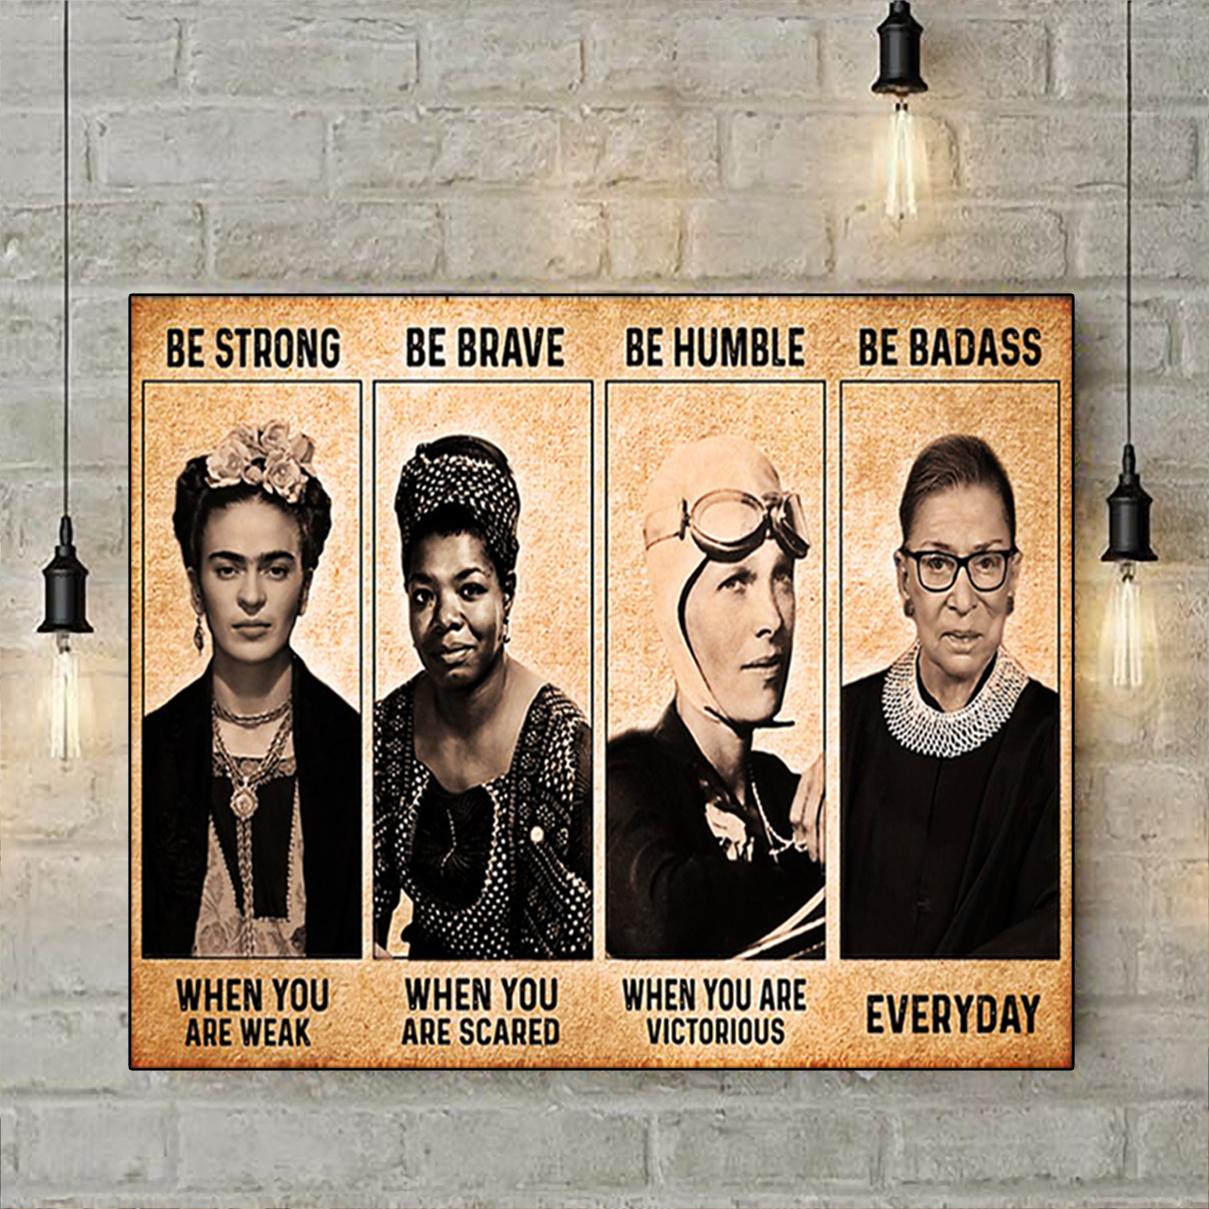 Frida Kahlo Maya Angelou Amelia Earhart Ruth Bader Ginsburg Feminist Be strong be brave poster